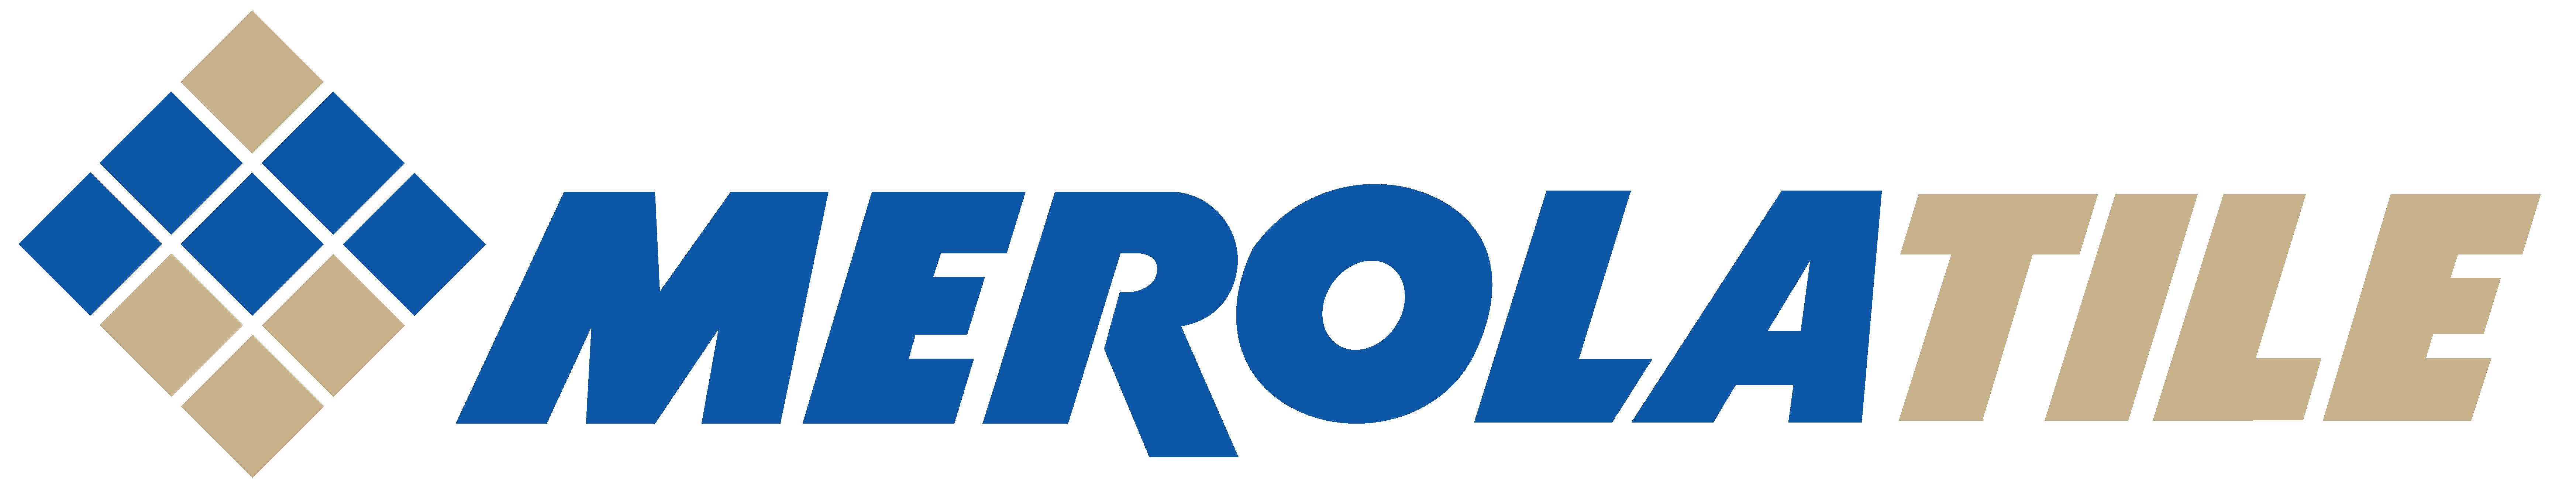 Merola Tile logo